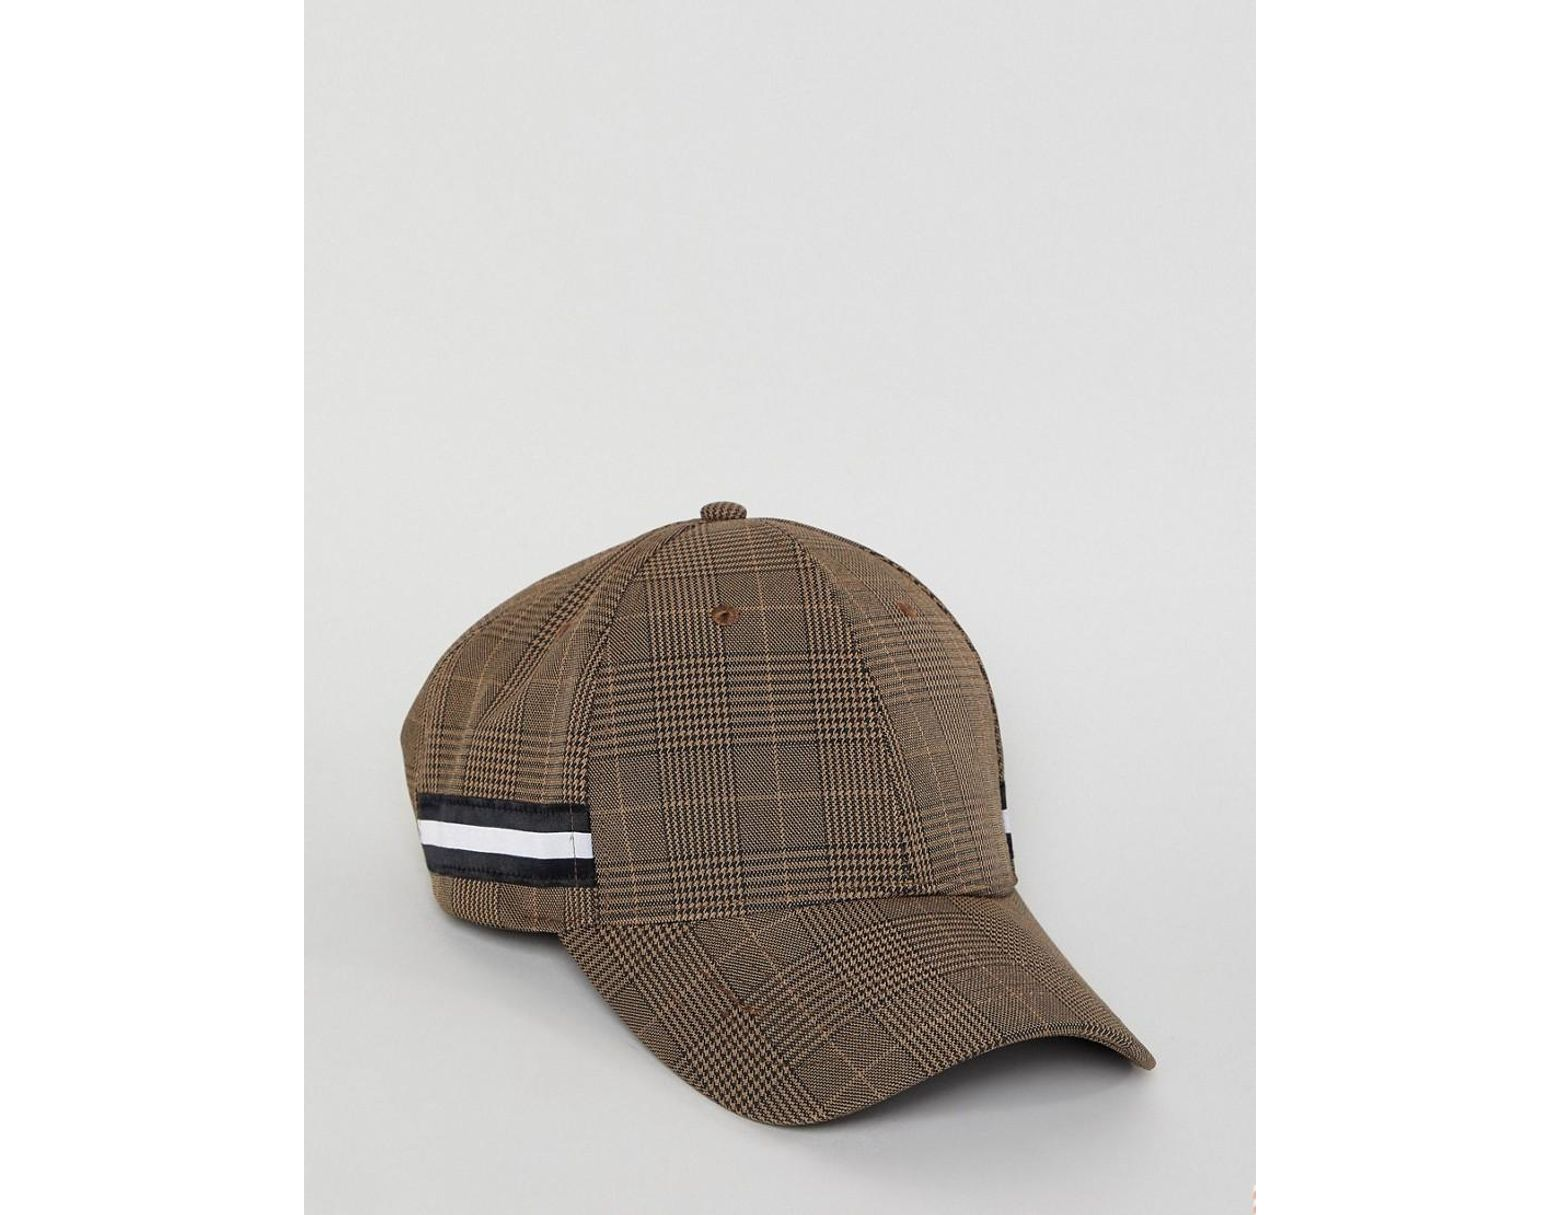 55df750e2f57 Gorra de cuadros marrones con detalle de cinta de hombre de color marrón